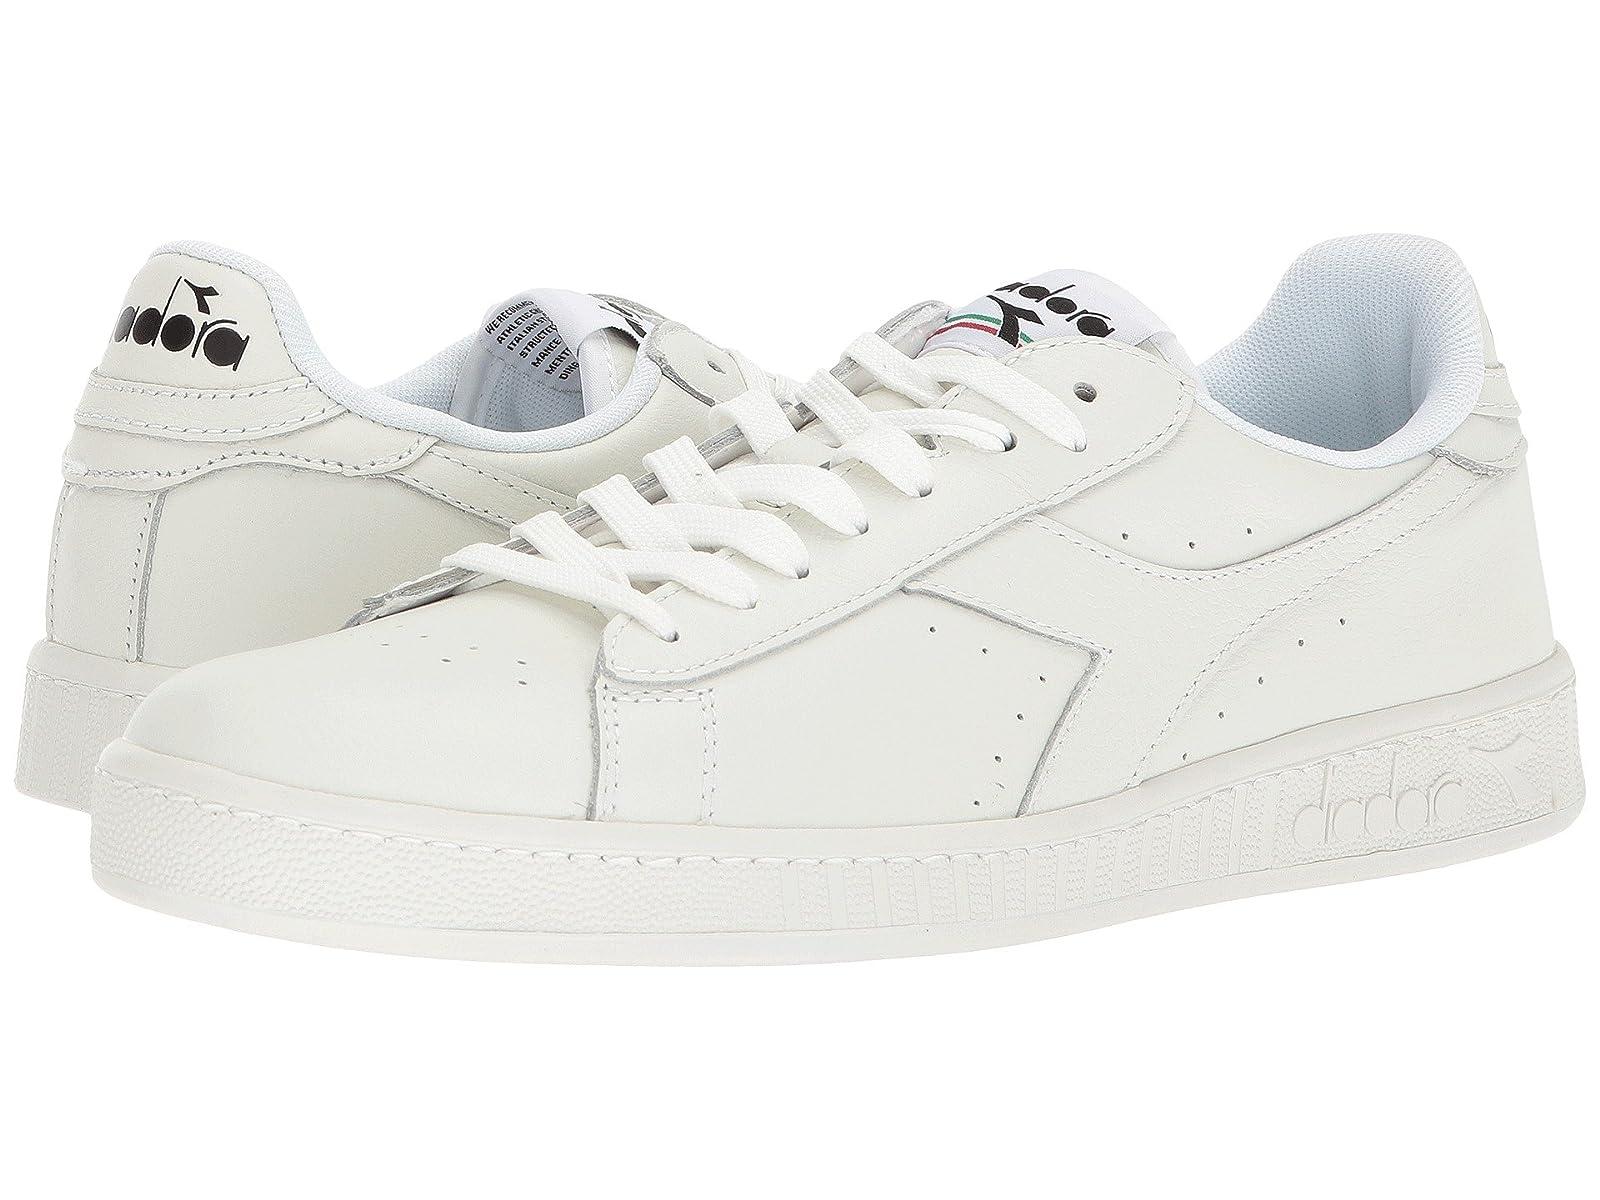 Diadora Game L LowCheap and distinctive eye-catching shoes